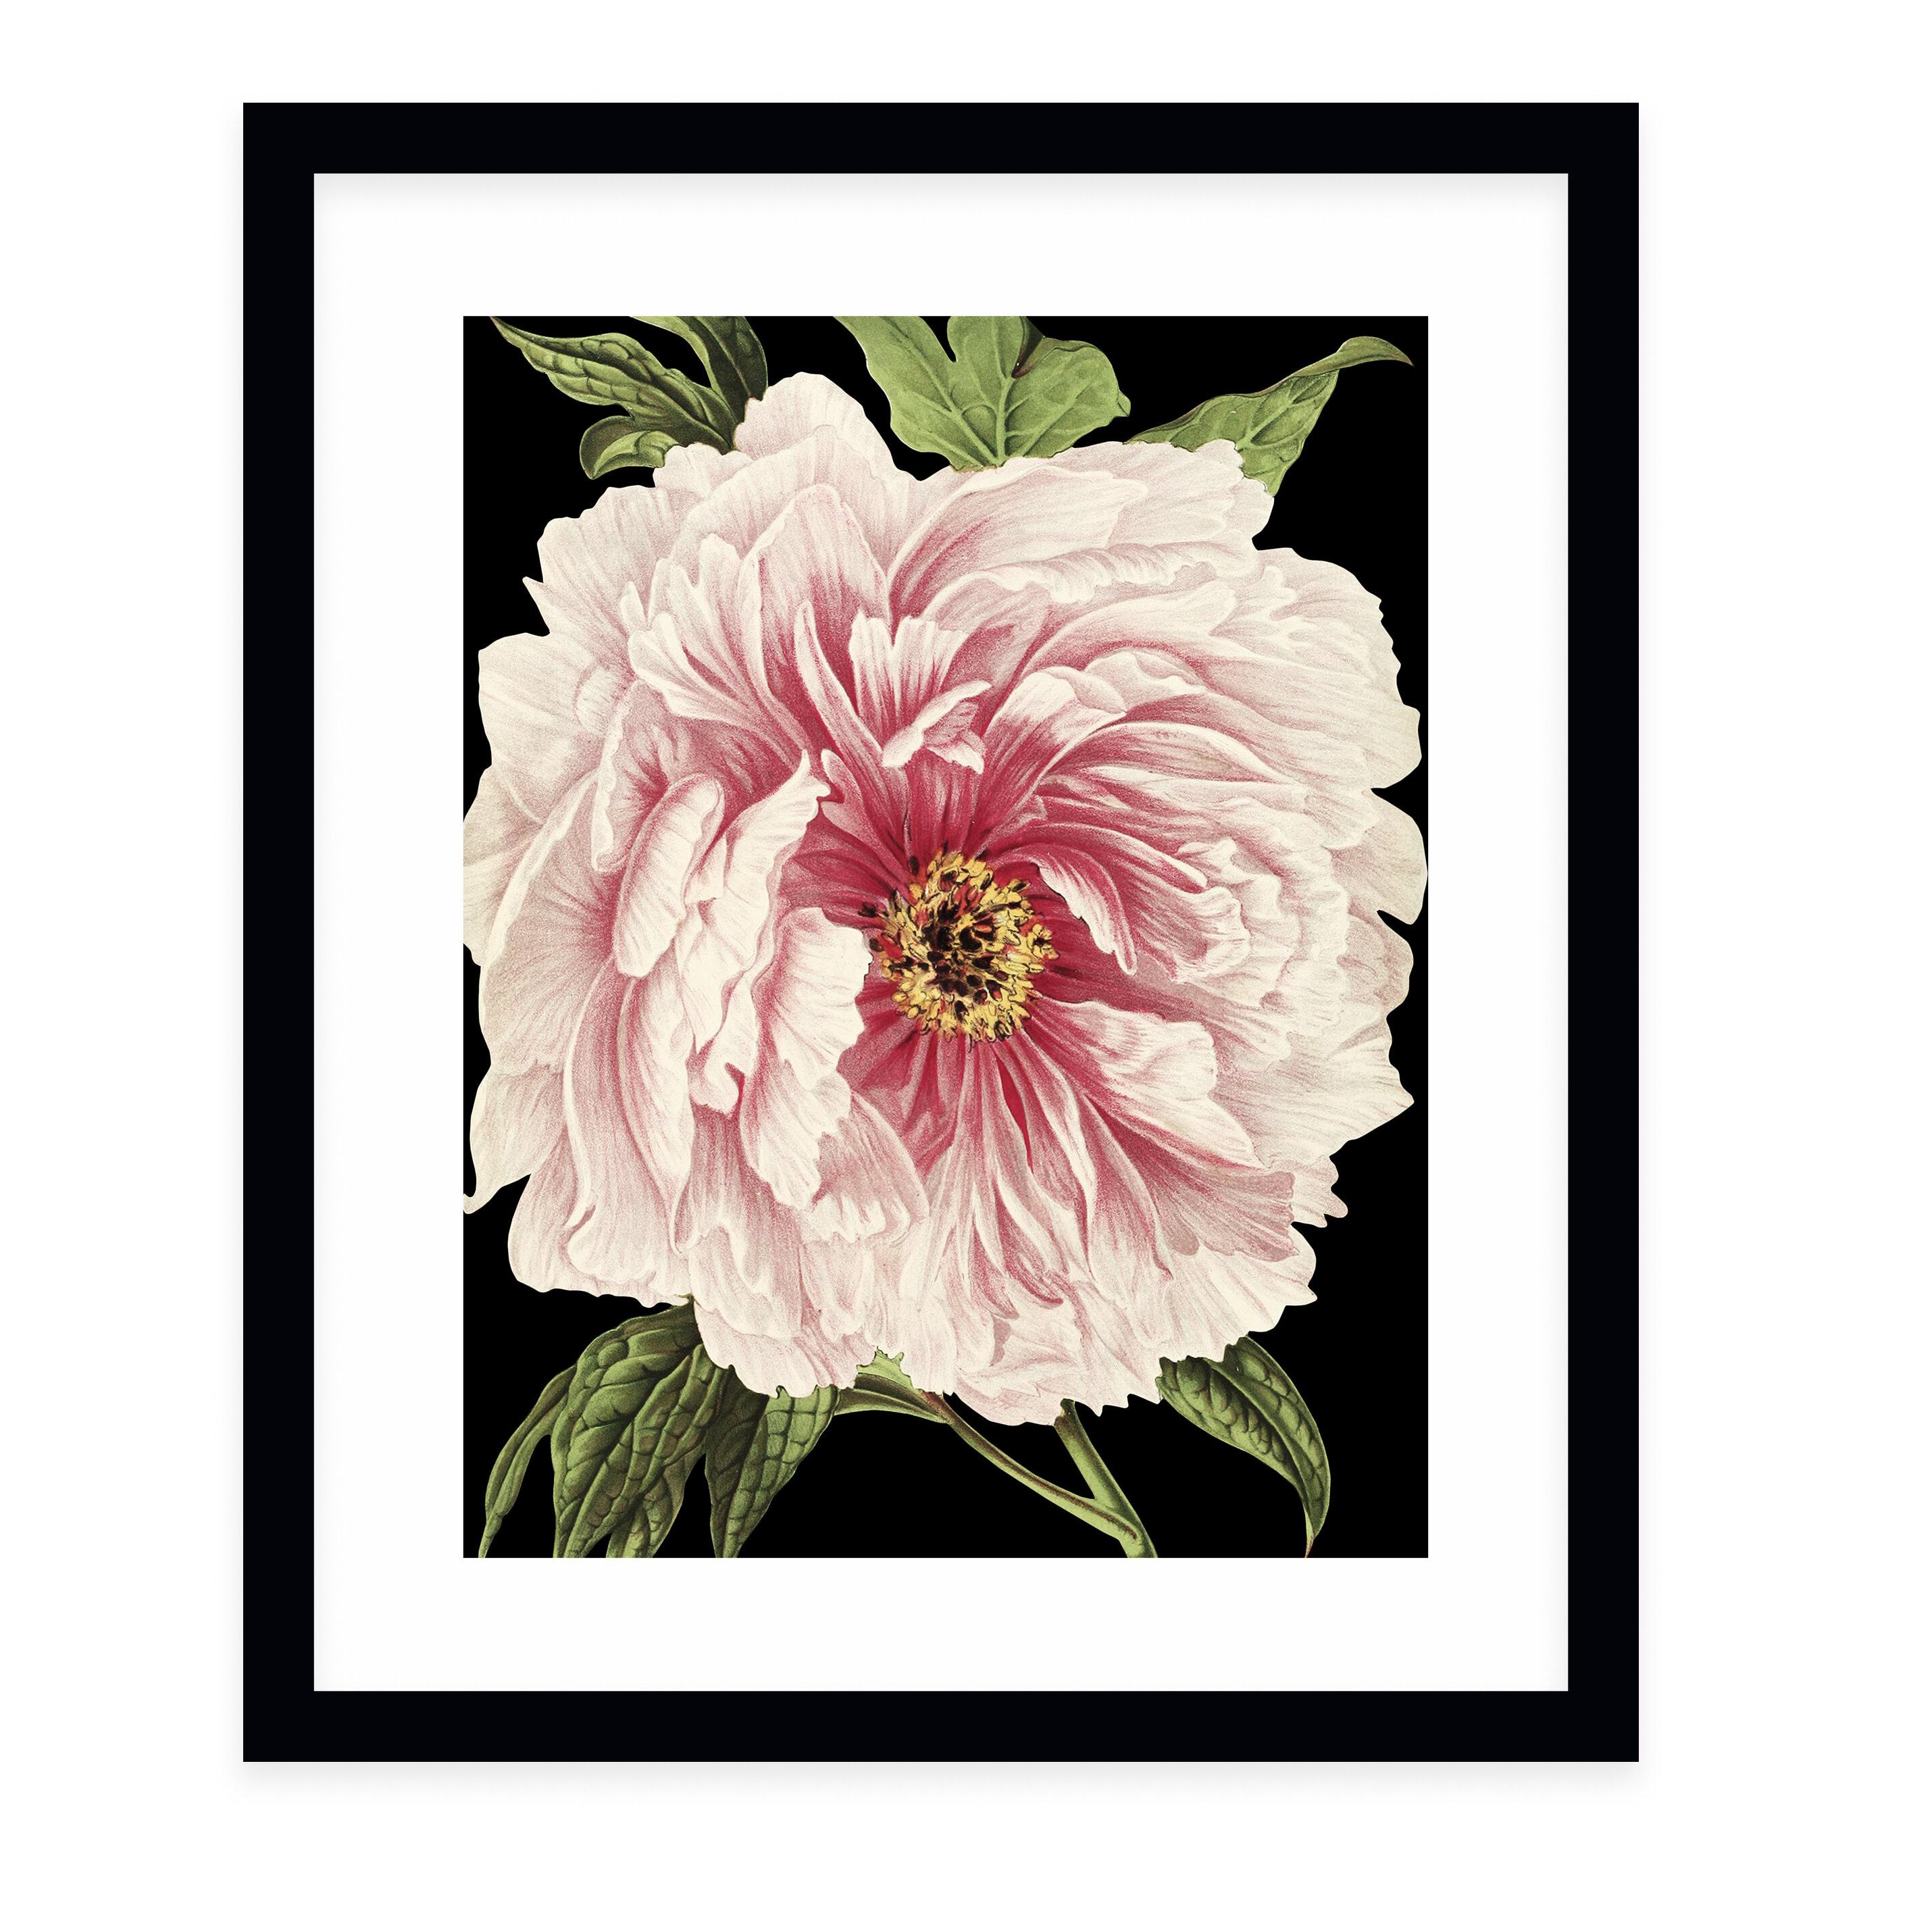 Charlton Home Flower Thirteen Black By Terri Ellis Picture Frame Graphic Art Print On Paper Wayfair